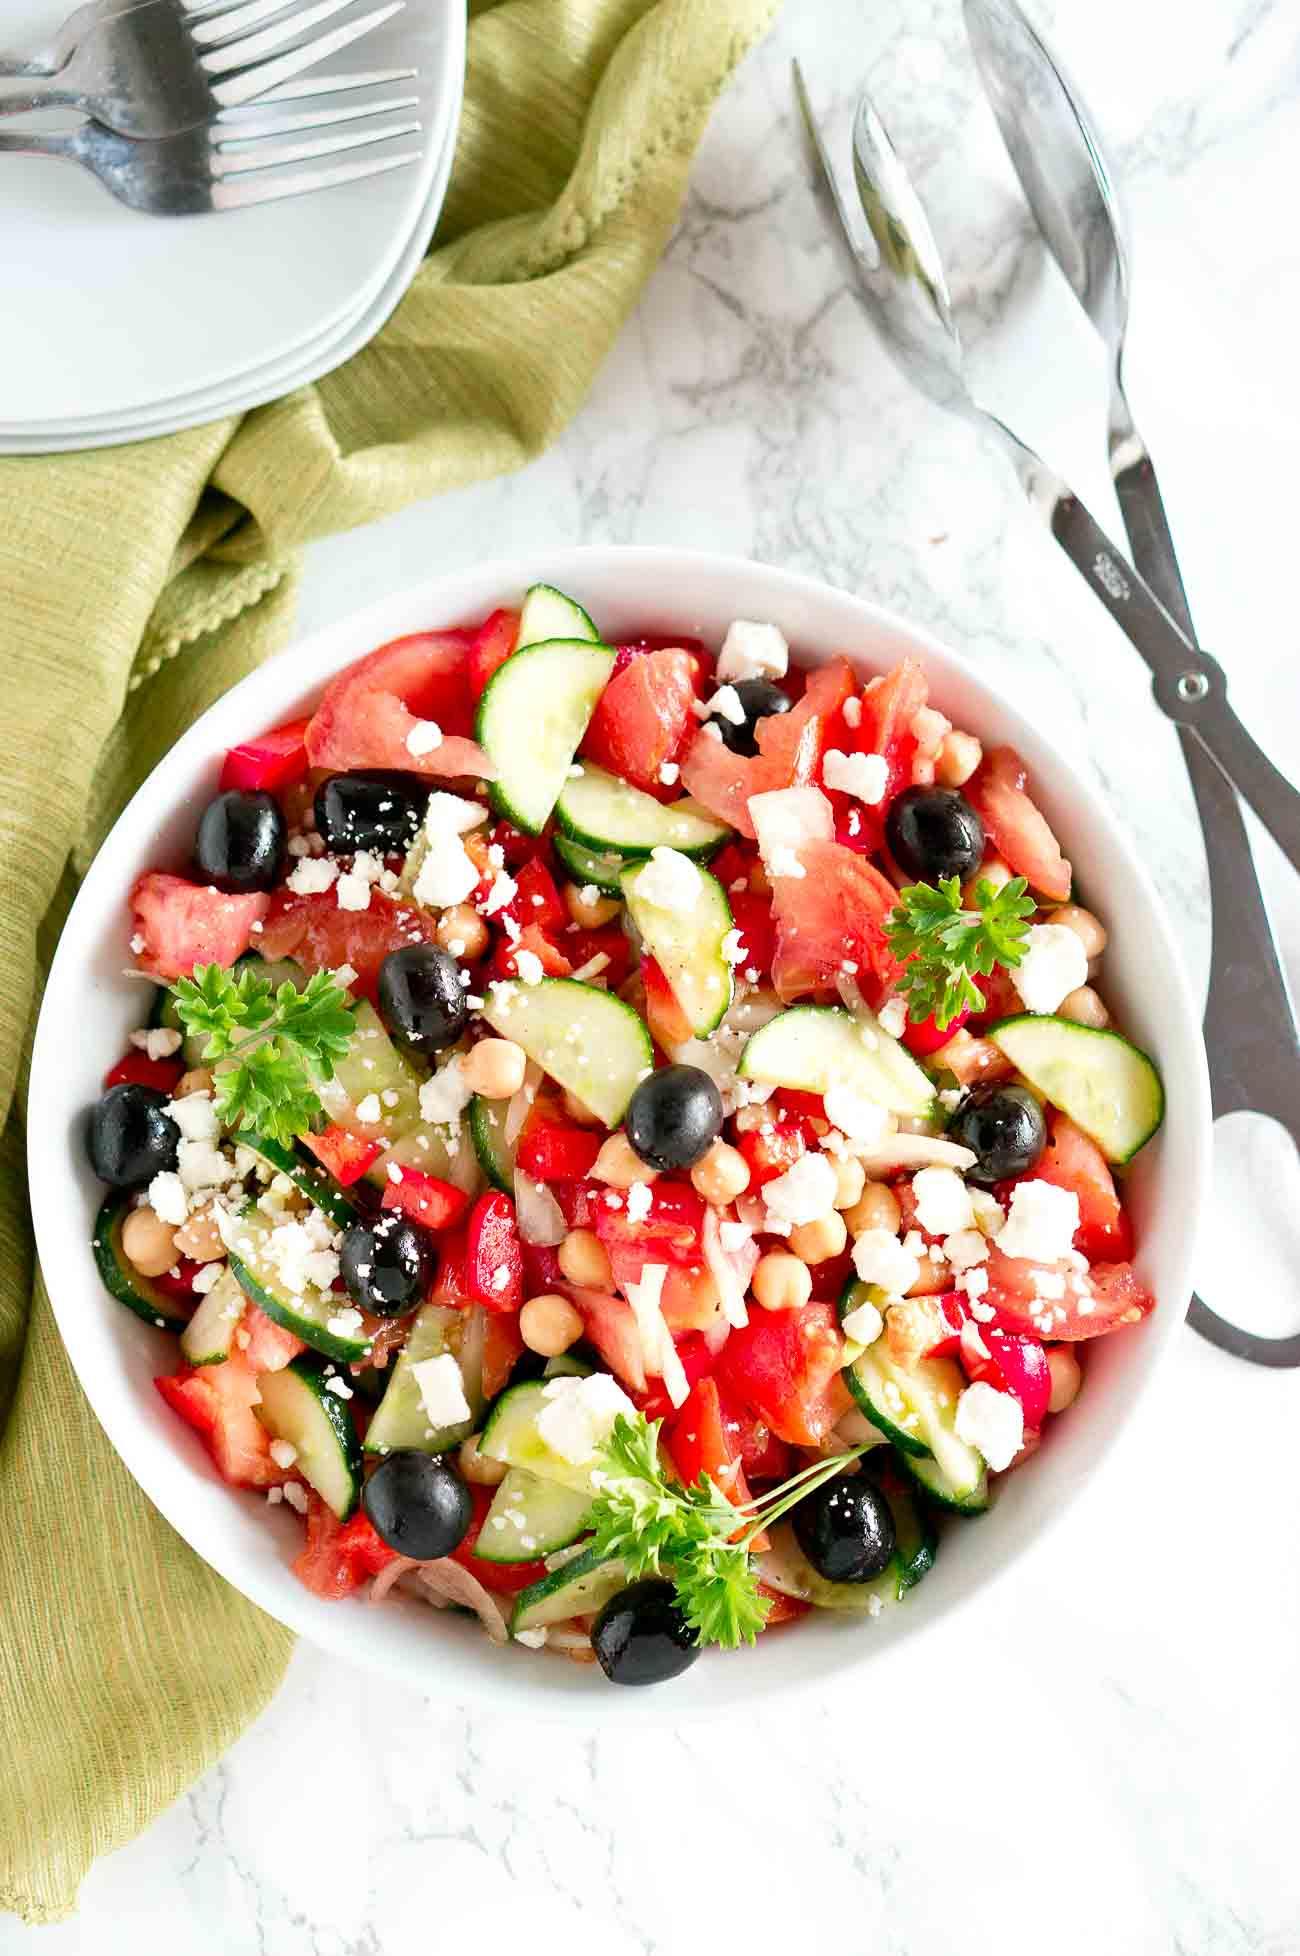 Top shot of the best Greek Salad - horiatiki salad in a bowl